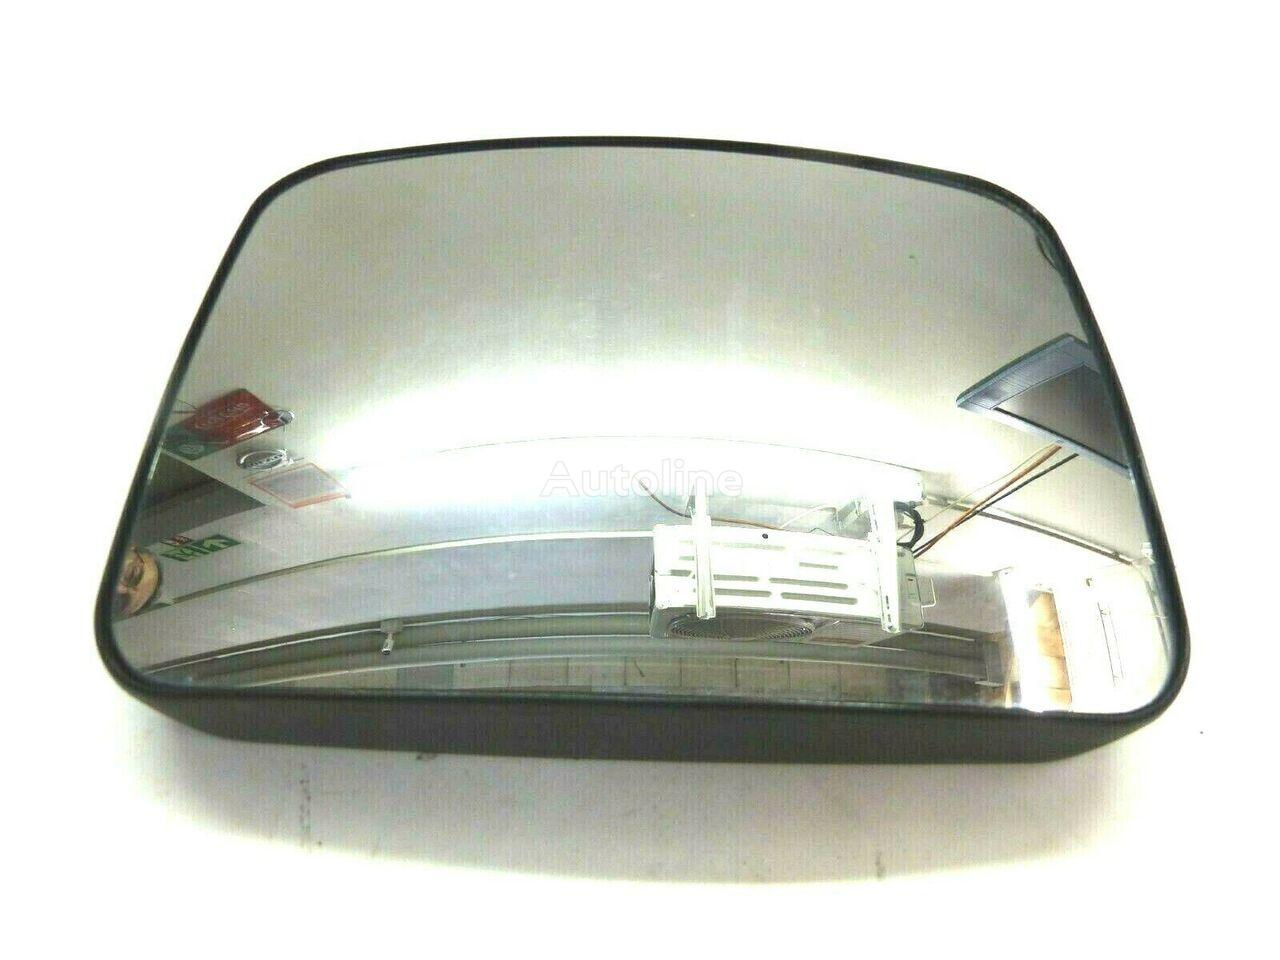 MEKRA Original Spiegelglas WW WR 300 Vergl espejo retrovisor para MAN TGA camión nuevo